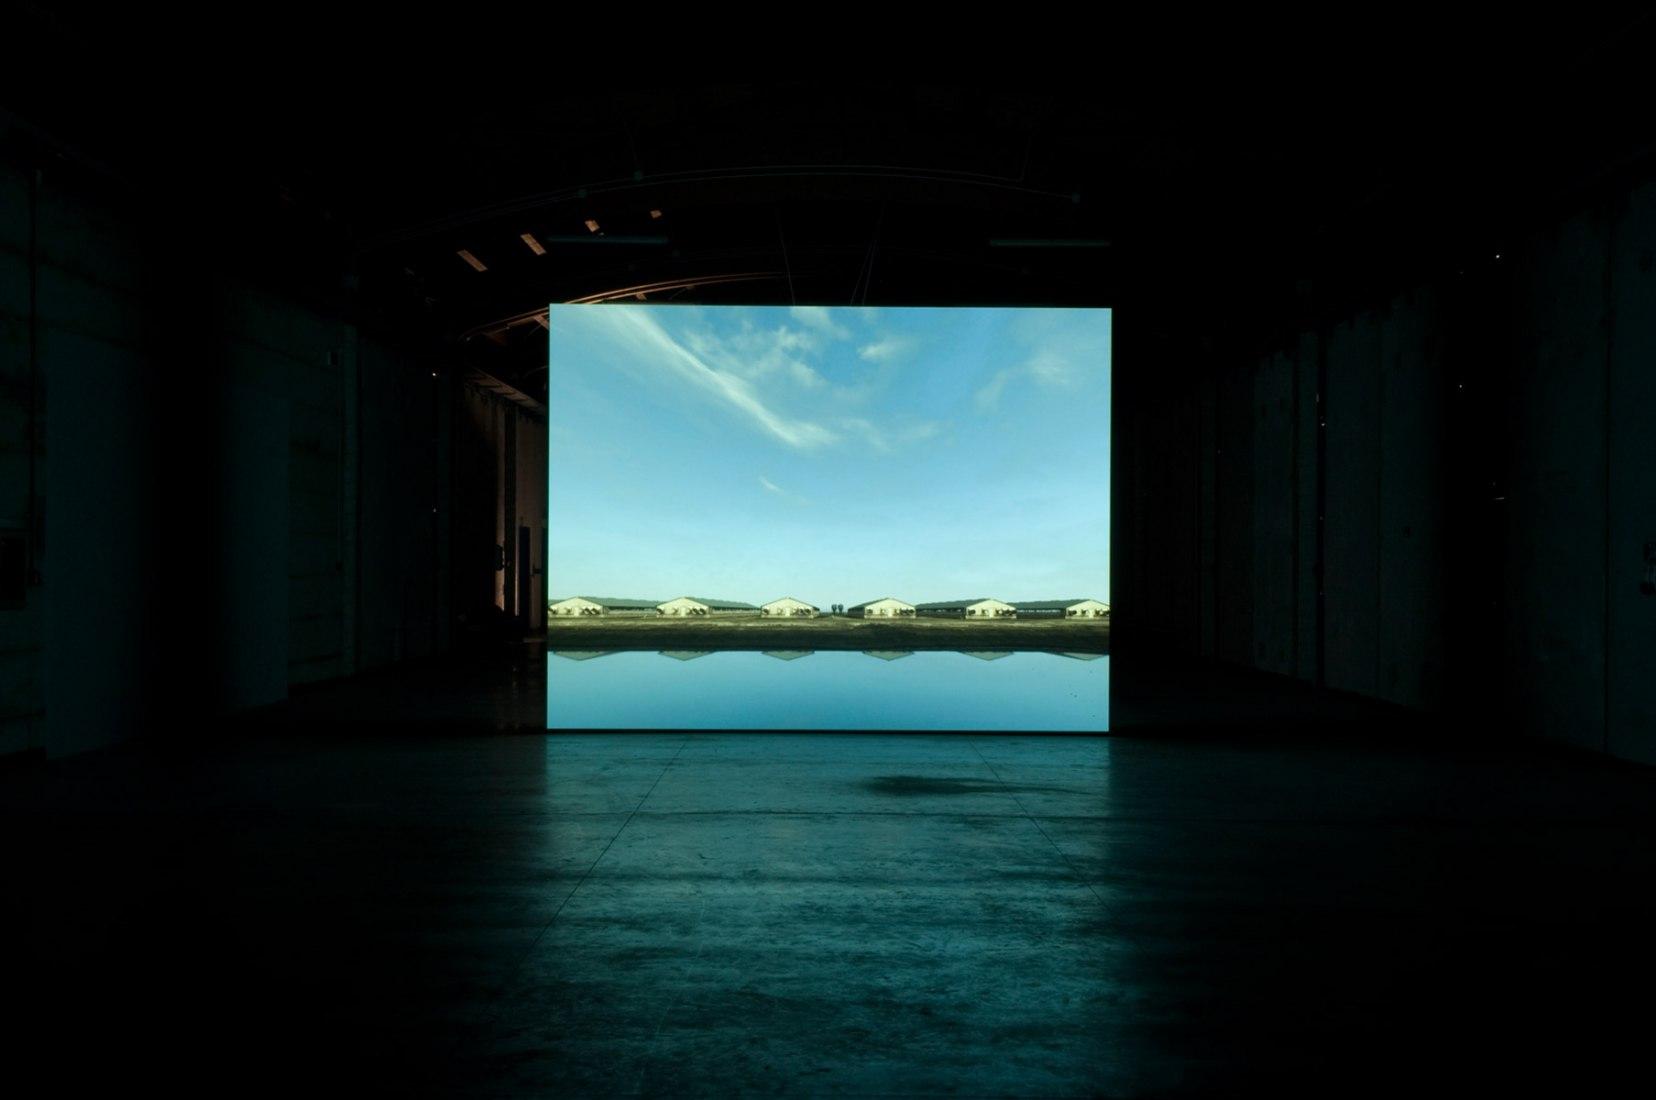 Grow Finish Unit (Near Elkhart, Kansas), 2008. Installation View, John Gerrard, Animated Scene. Isola di Certosa, Venice Biennale 2009.